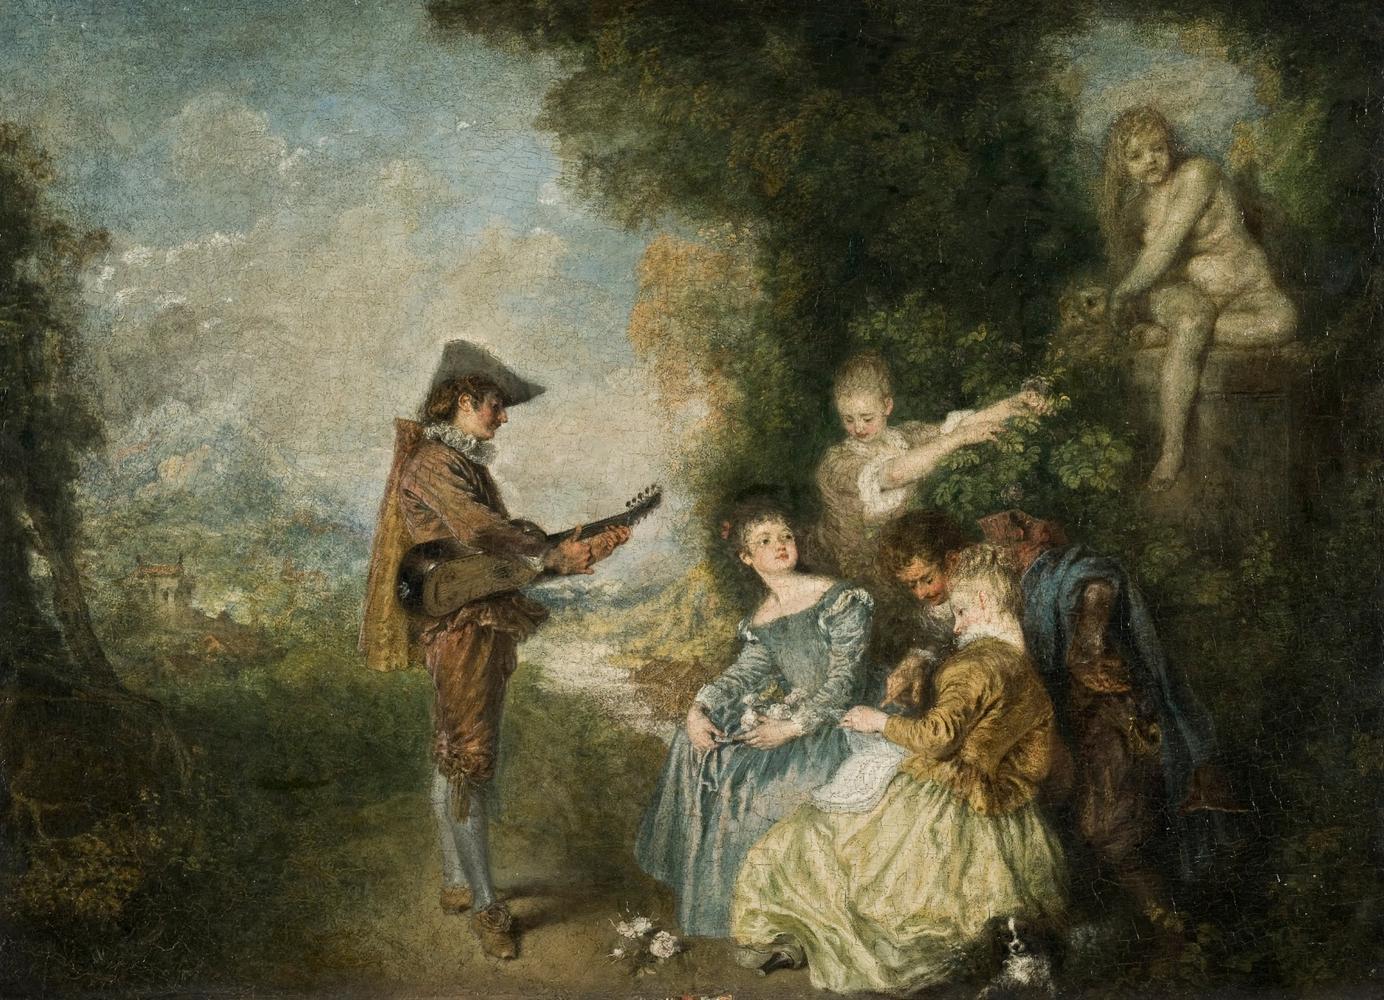 watteau - The Love Lesson 1716 Nationalmuseum Stoc;kholm.jpg